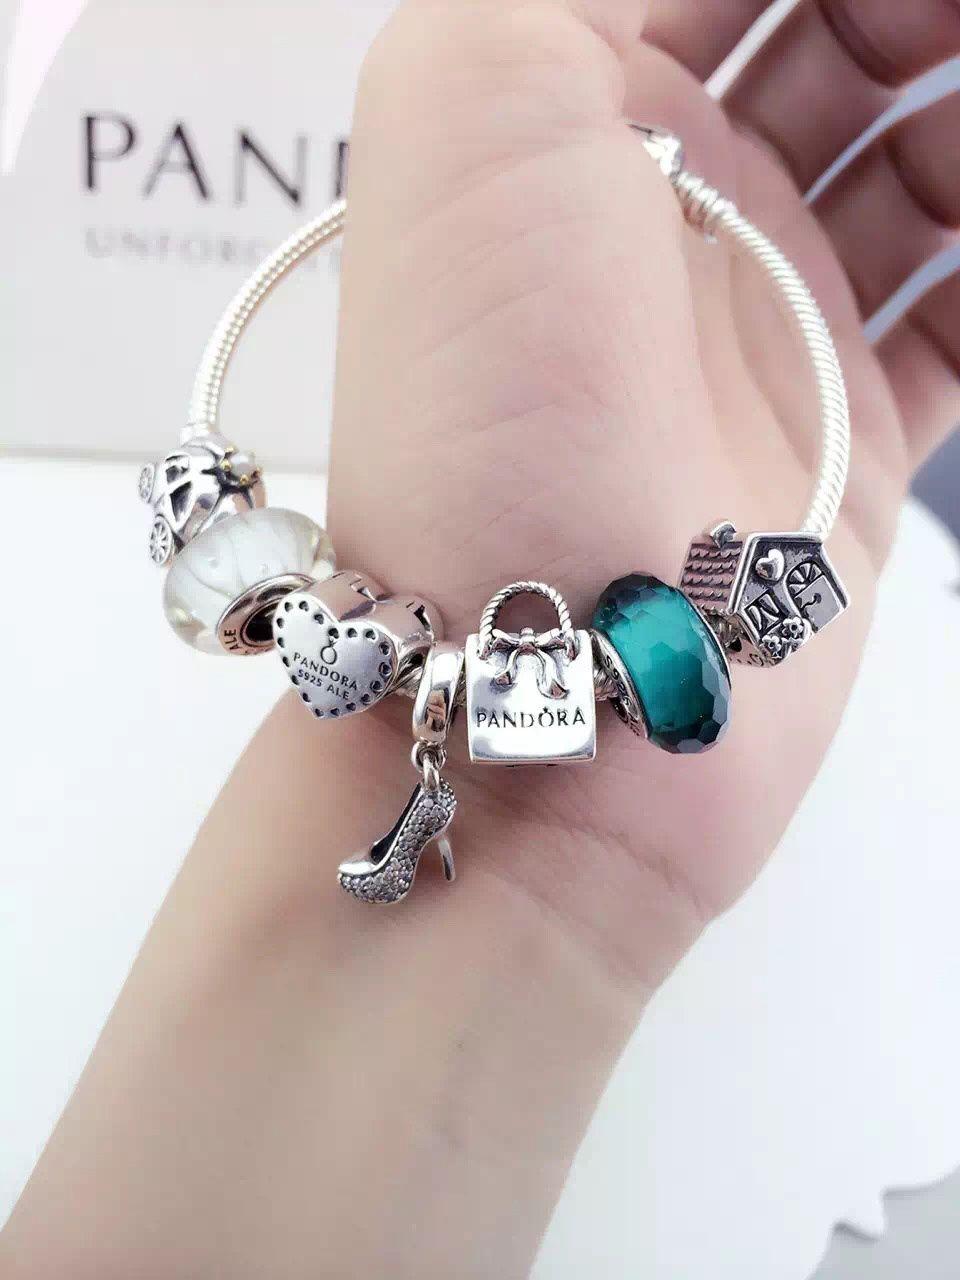 960cbedc147 Pandora Sterling Silver Charm Bracelet CB01559 - Pandora Online Shop ...